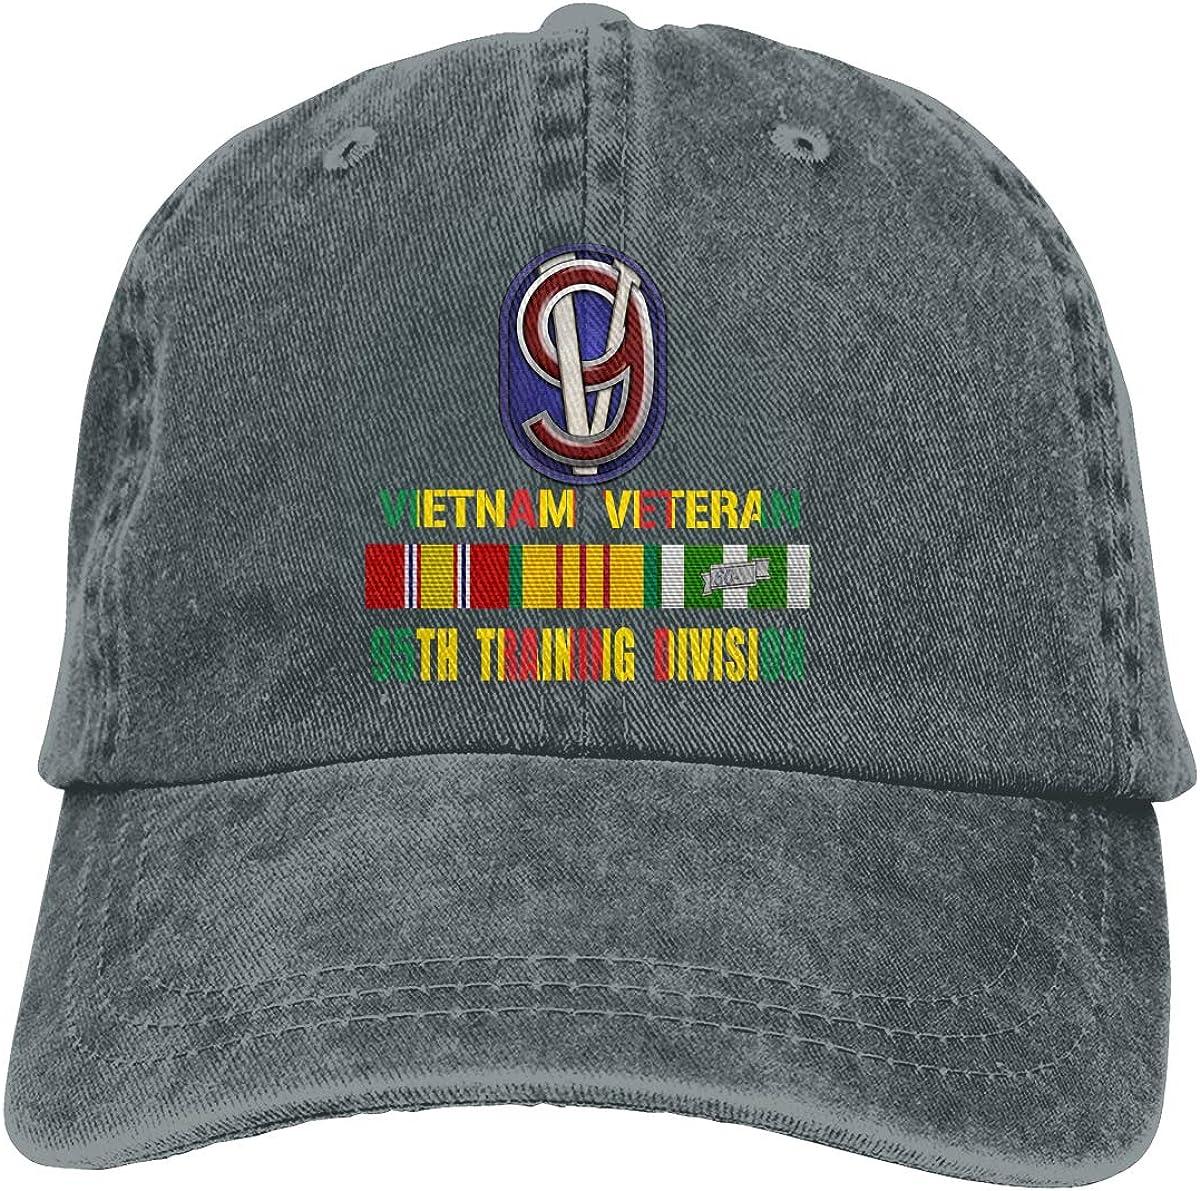 JKJS LDFO Vietnam Veteran 95th Training Division Unisex Baseball Cap Cowboy Hat Dad Hats Trucker Hat